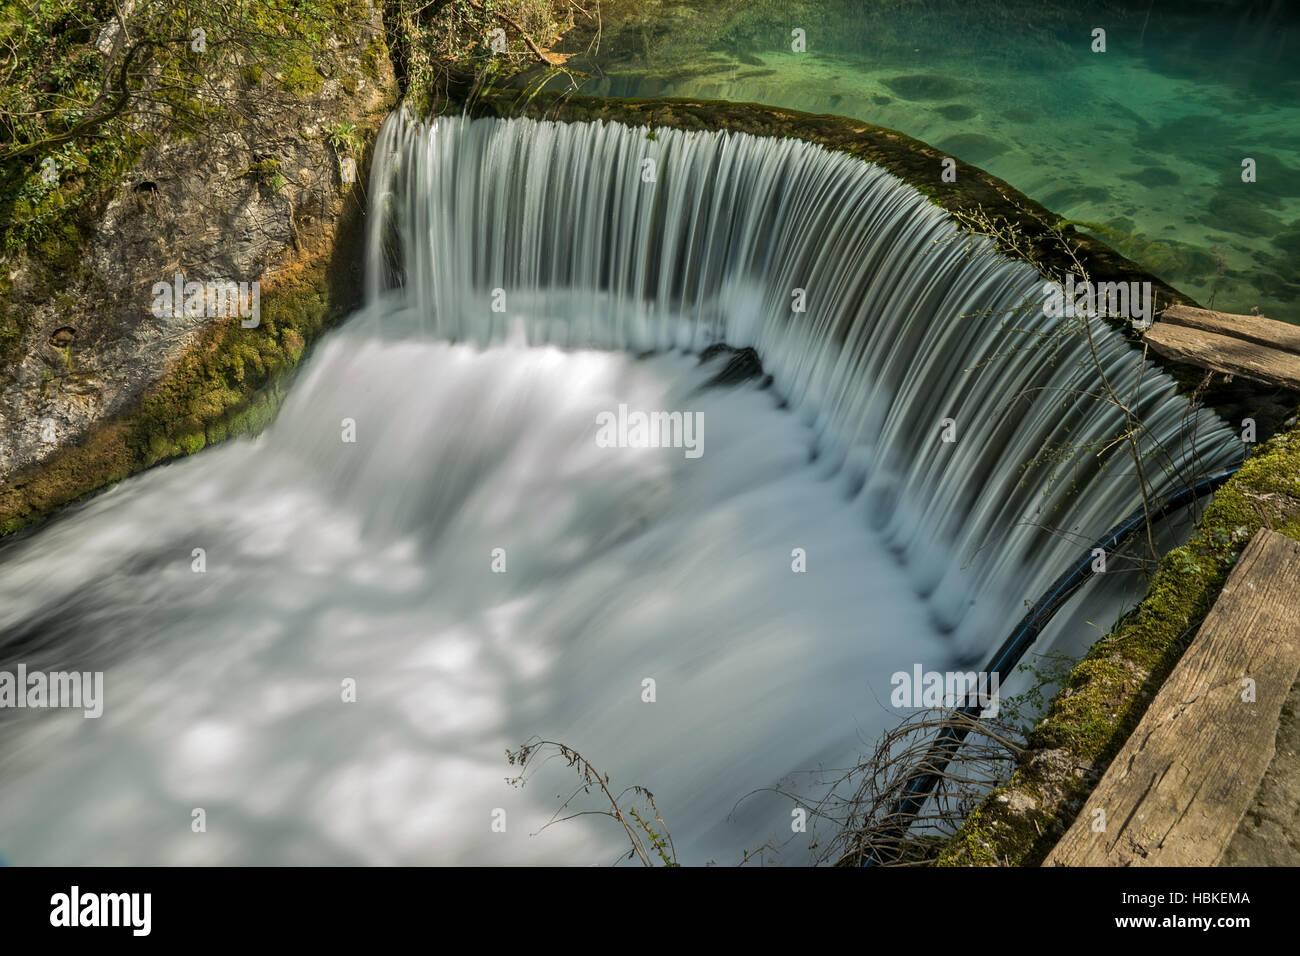 Semicircular dam with small lake that cause waterfall on river Rasina in Serbia - Stock Image